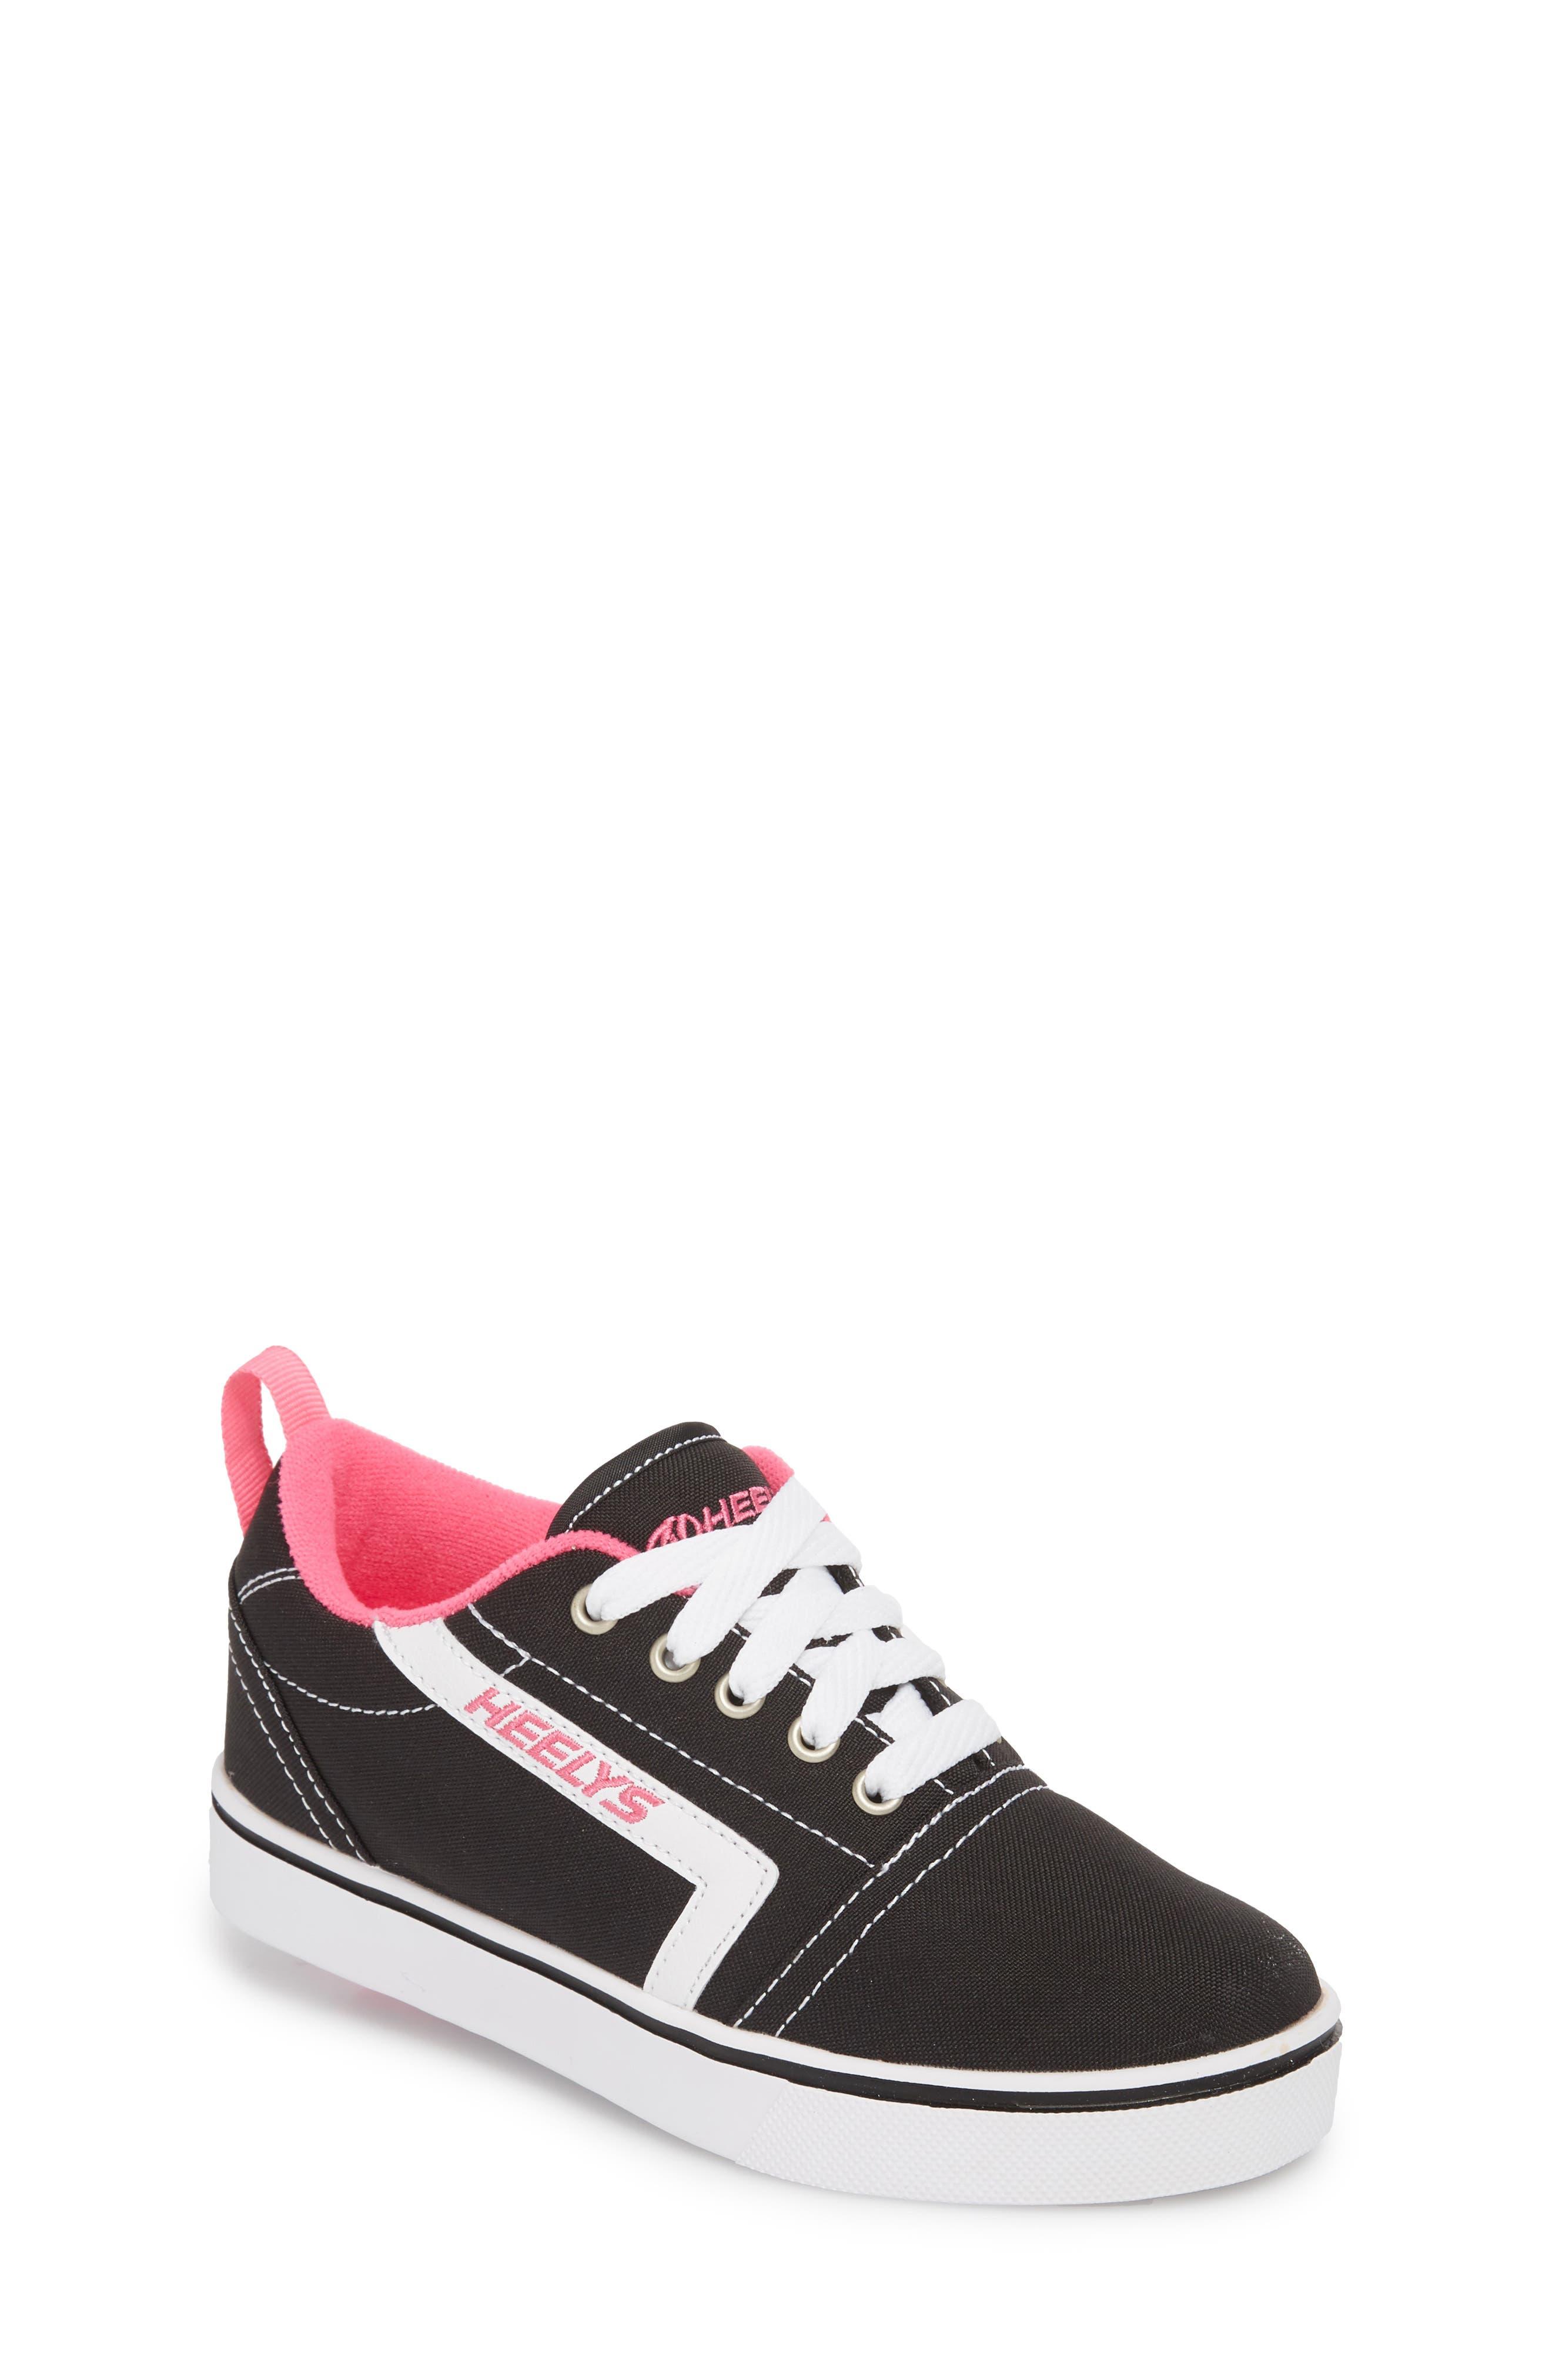 GR8 Pro Wheeled Sneaker,                         Main,                         color, 002